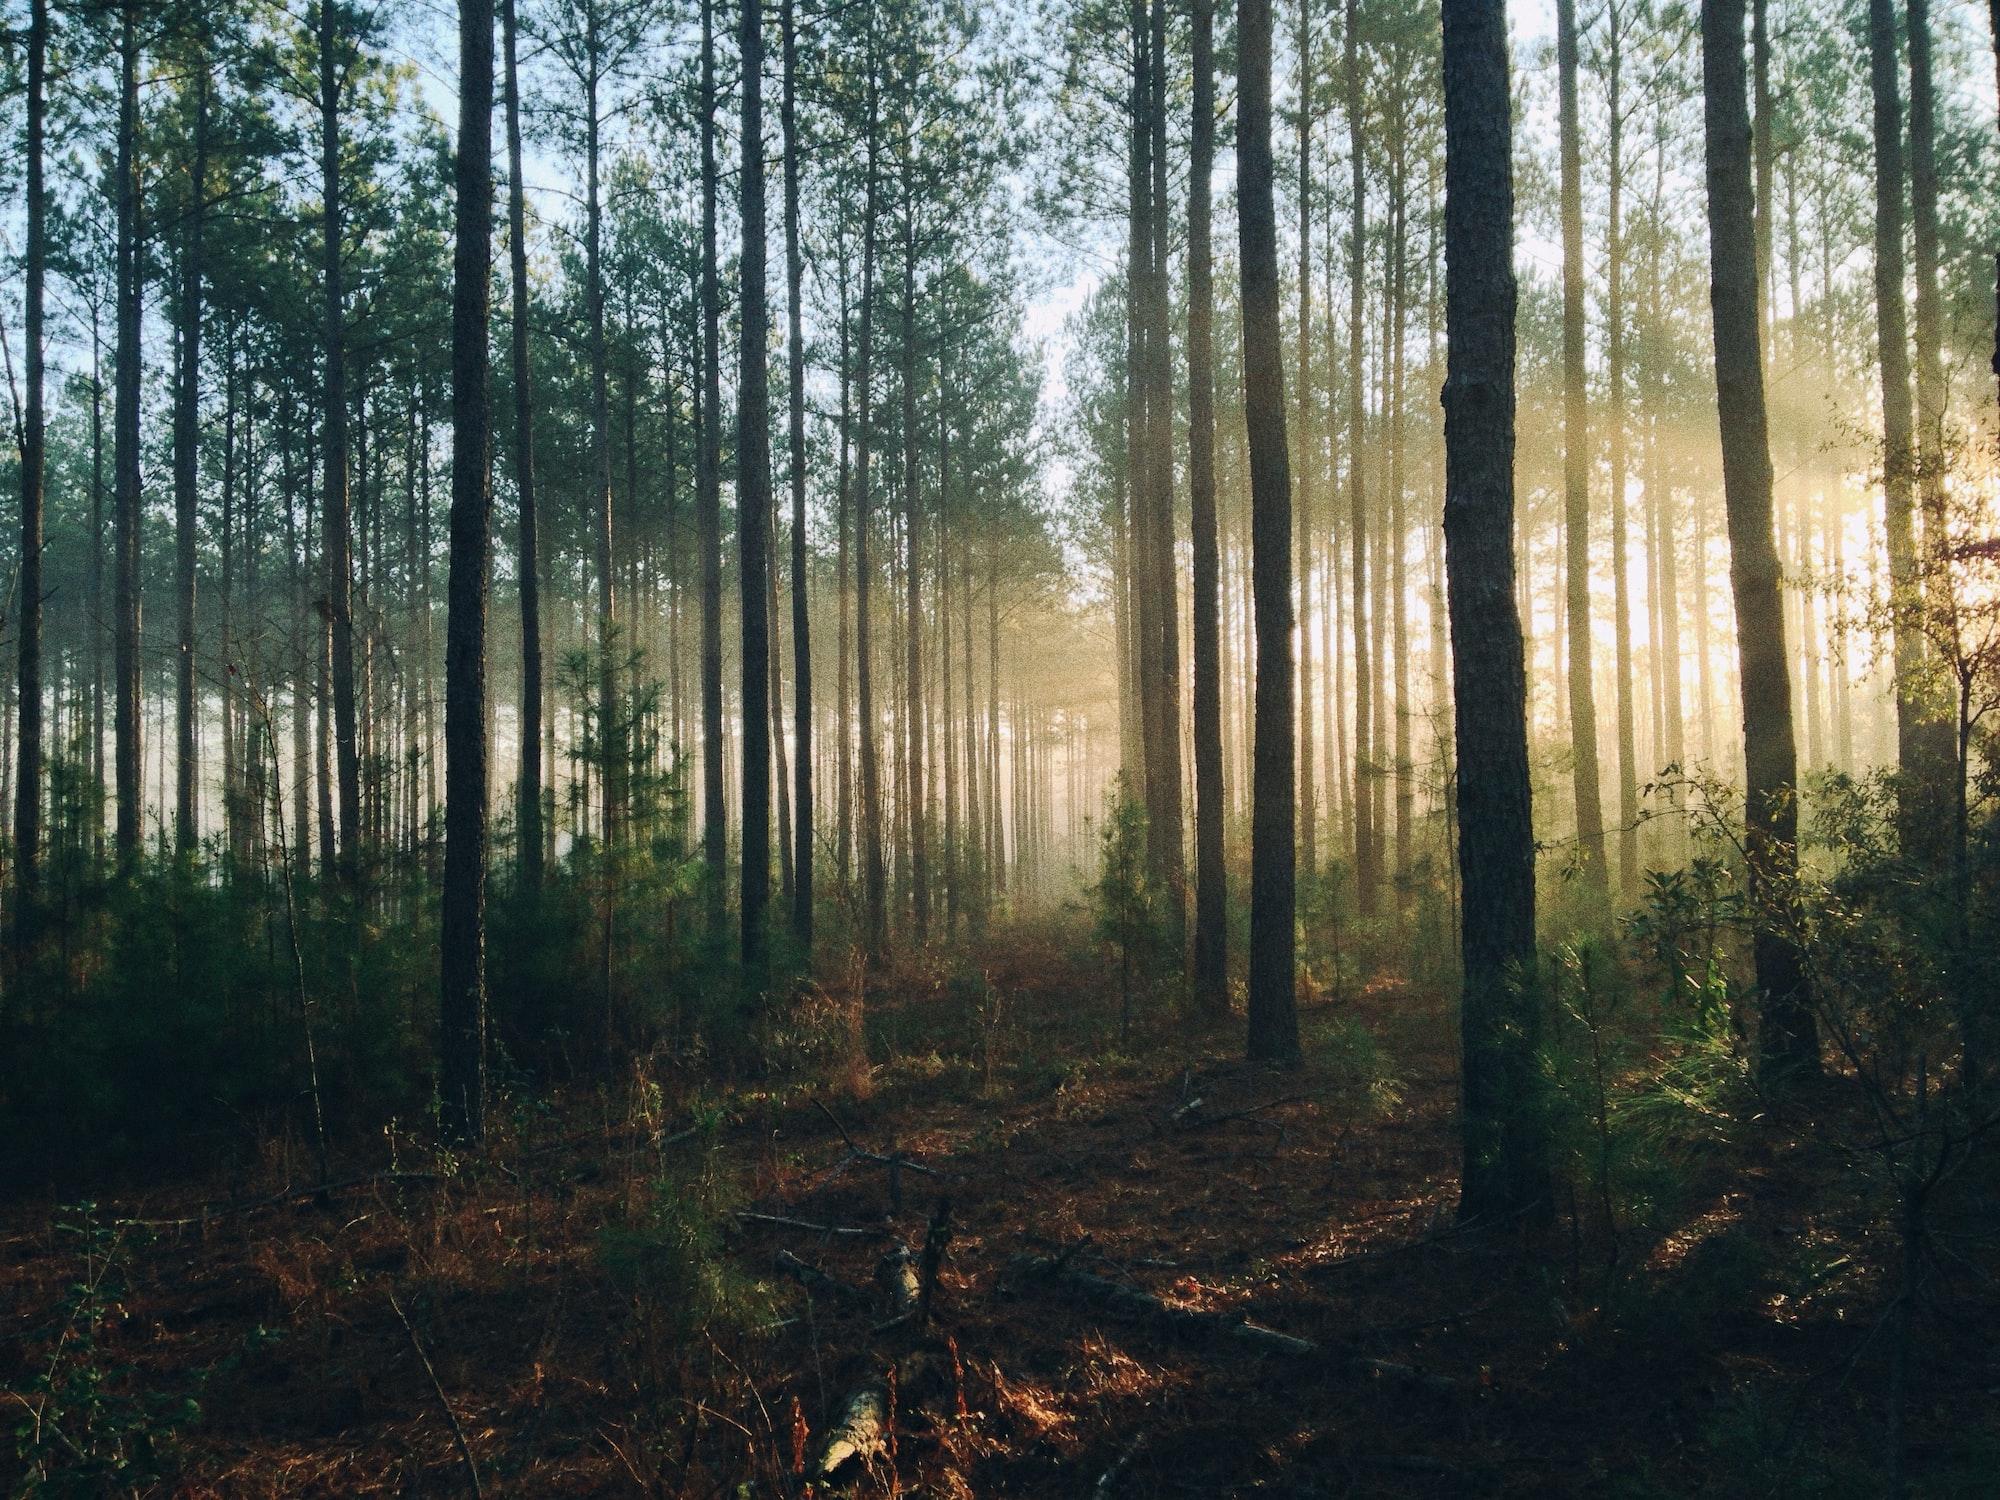 Illuminated woods